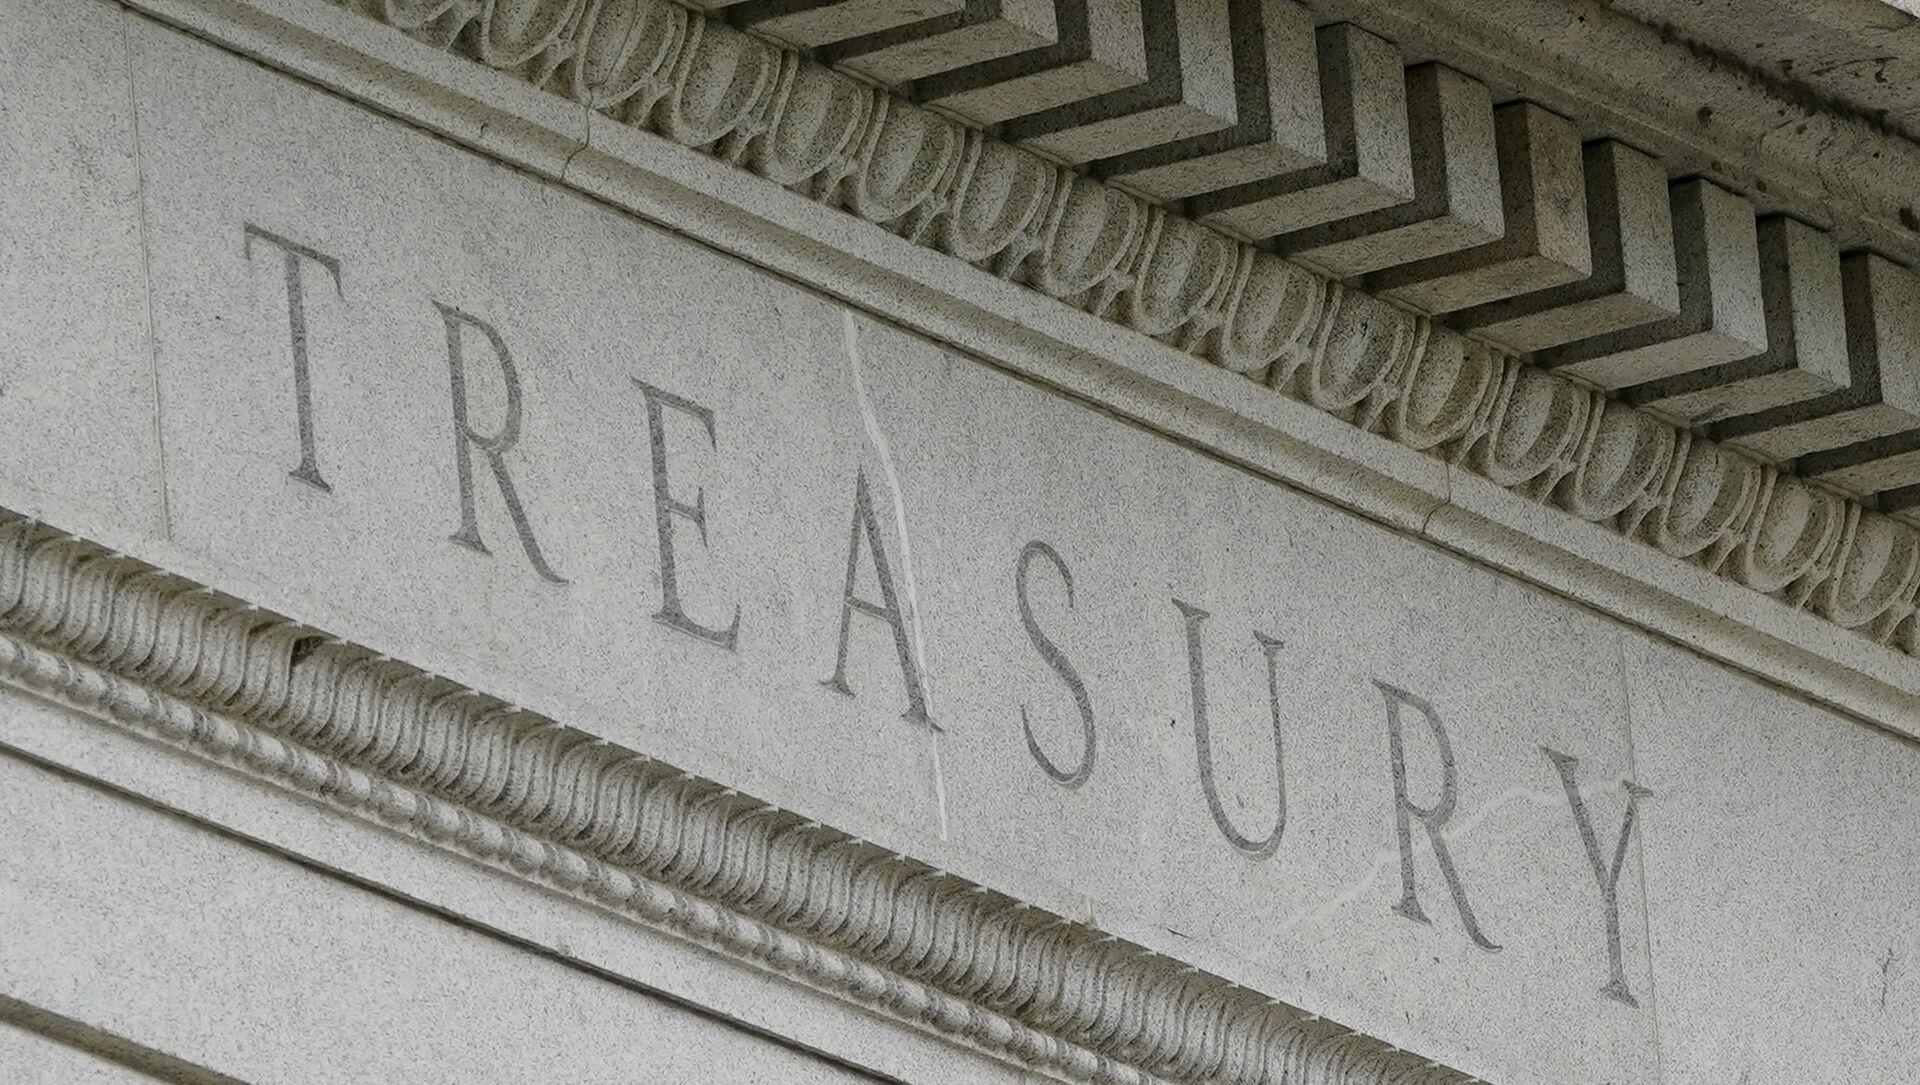 This May 4, 2021 file photo shows the Treasury Building in Washington - Sputnik International, 1920, 23.07.2021